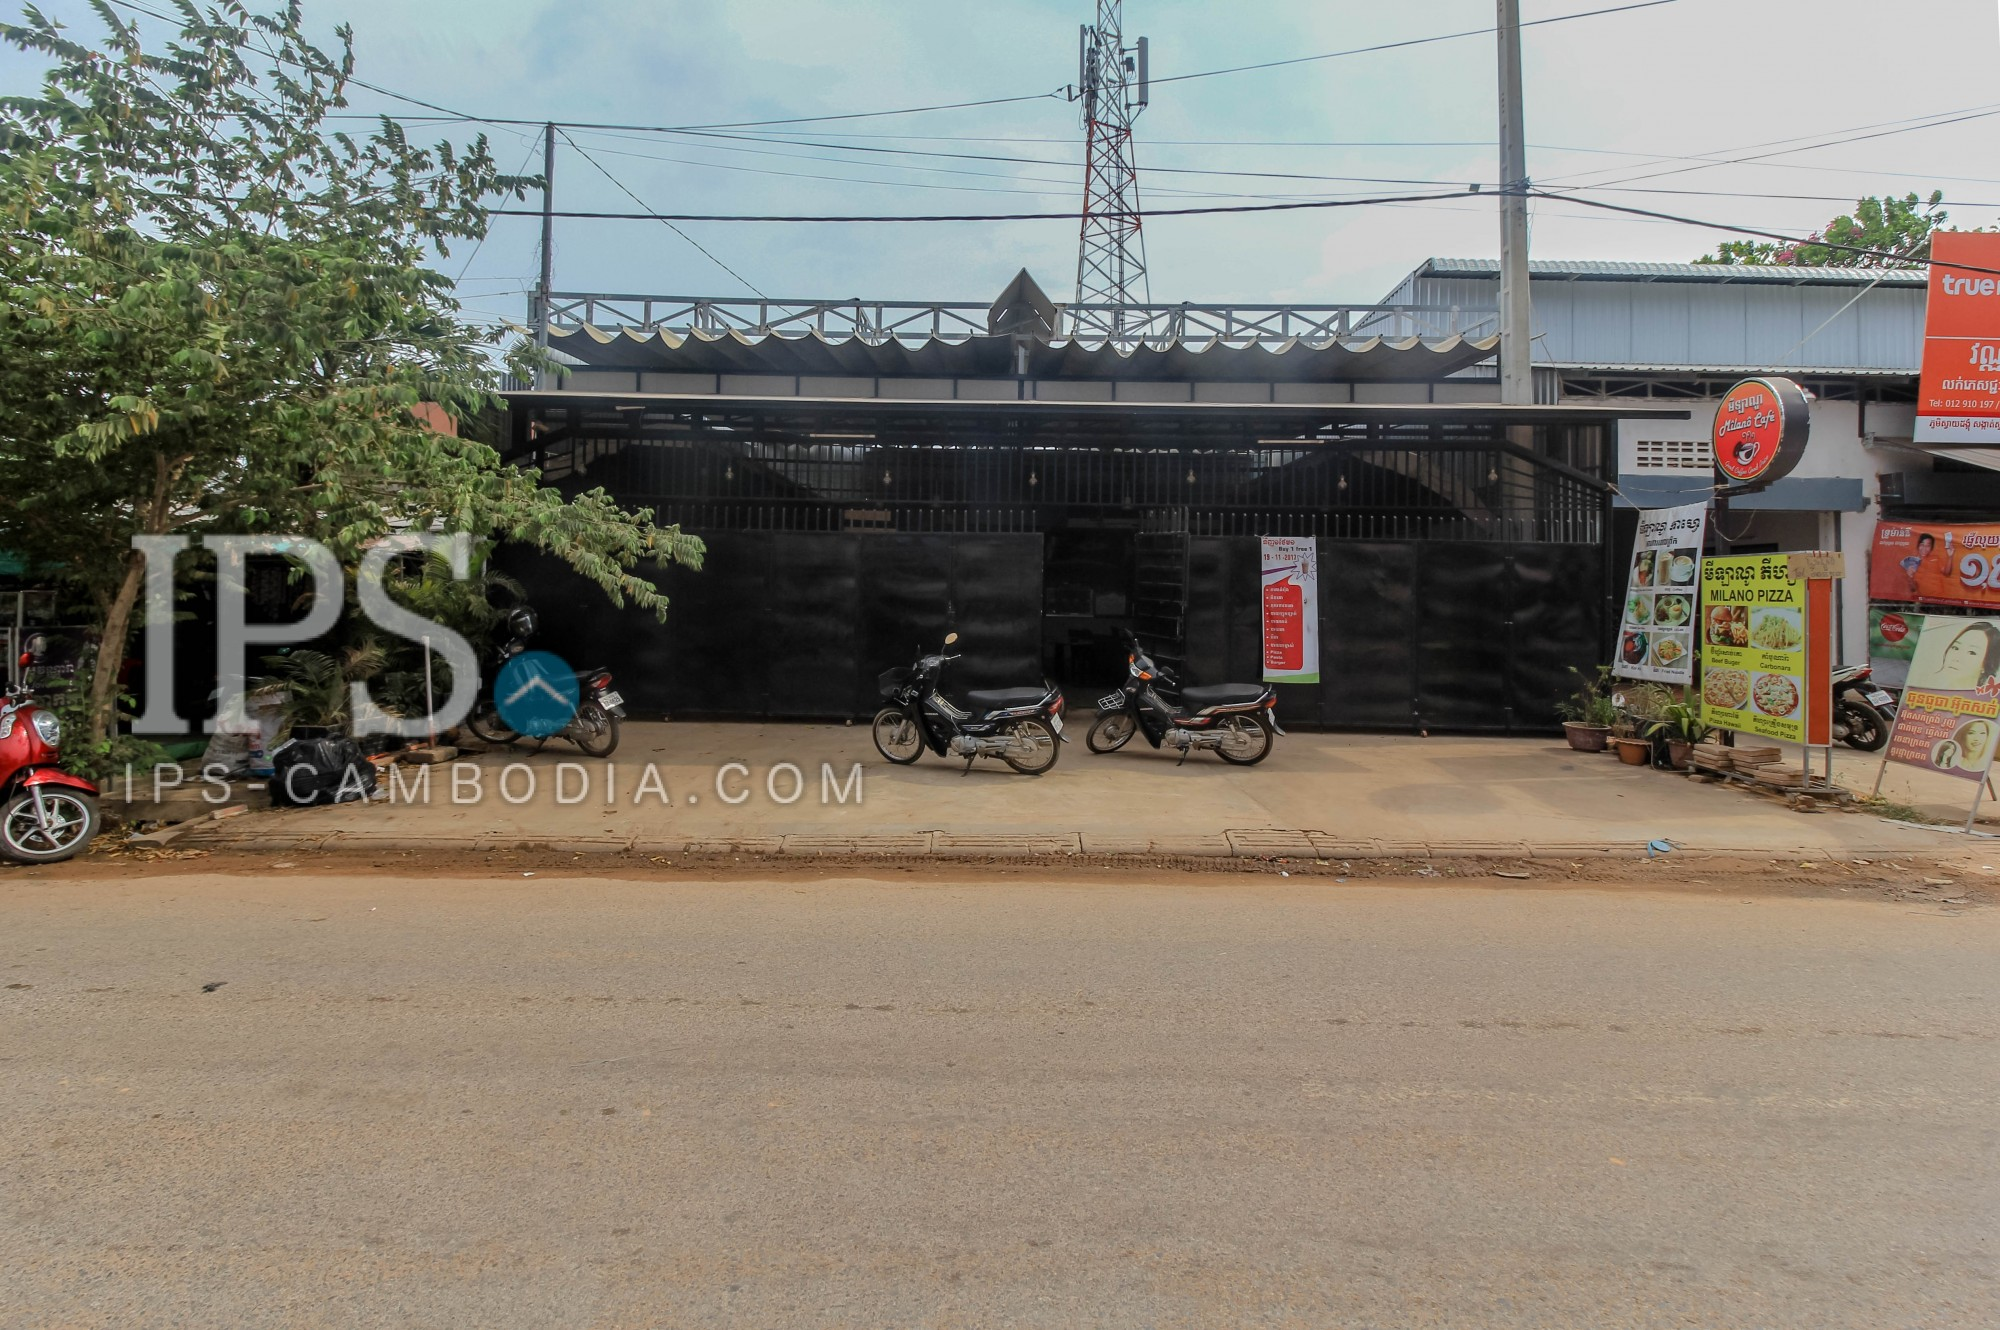 420 Sqm Restaurant Space For Sale - Sok San Road, Siem Reap